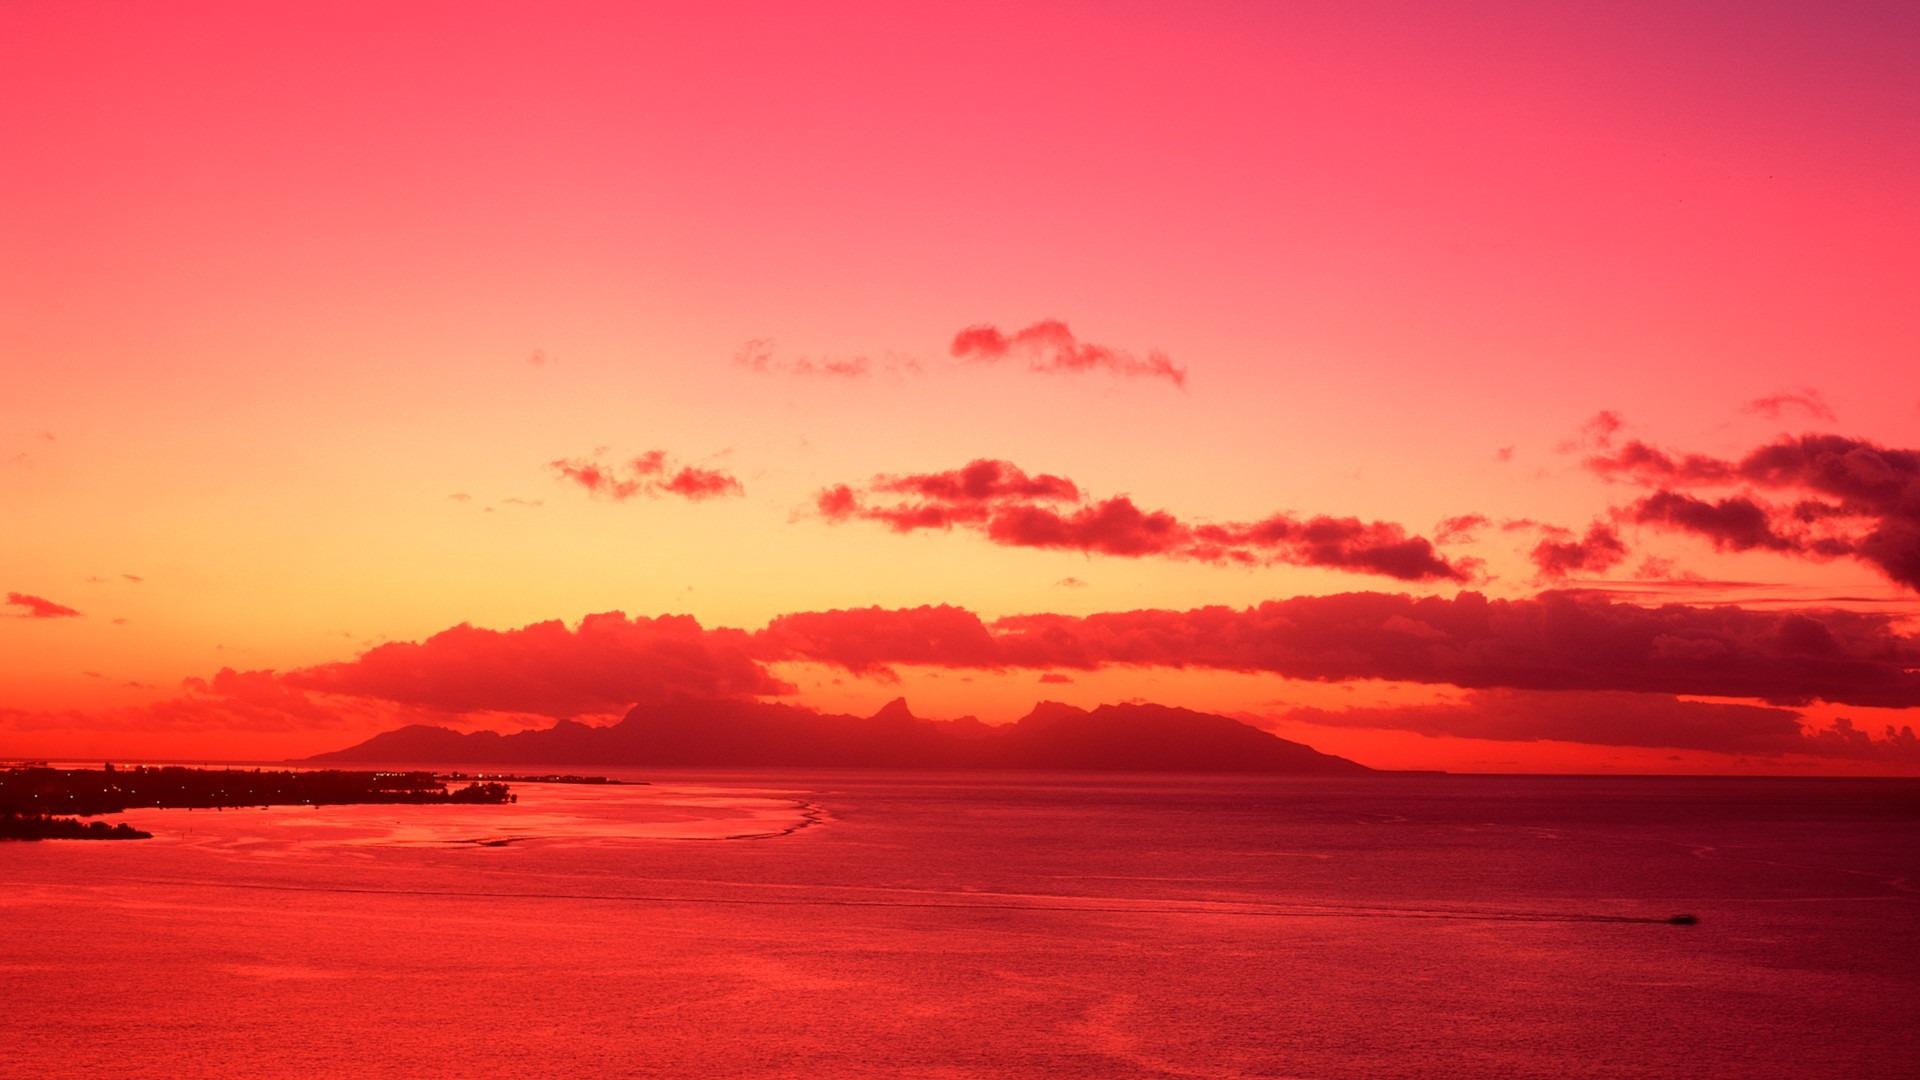 Tahiti Blood Red Sunset Wallpaper Preview 10wallpaper Com